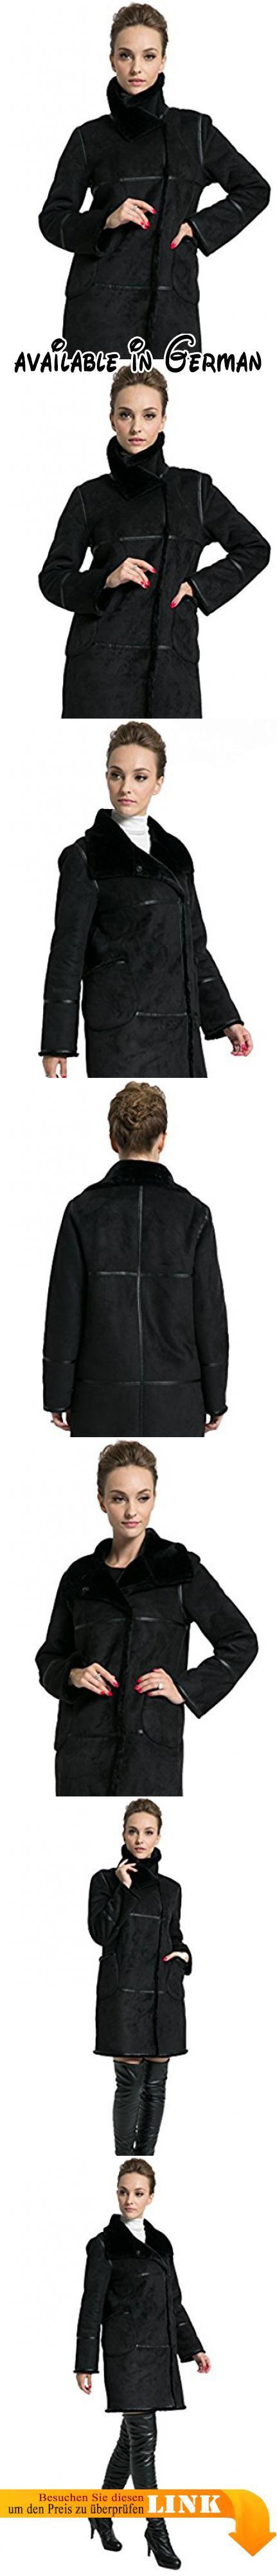 Veloursleder mantel schwarz